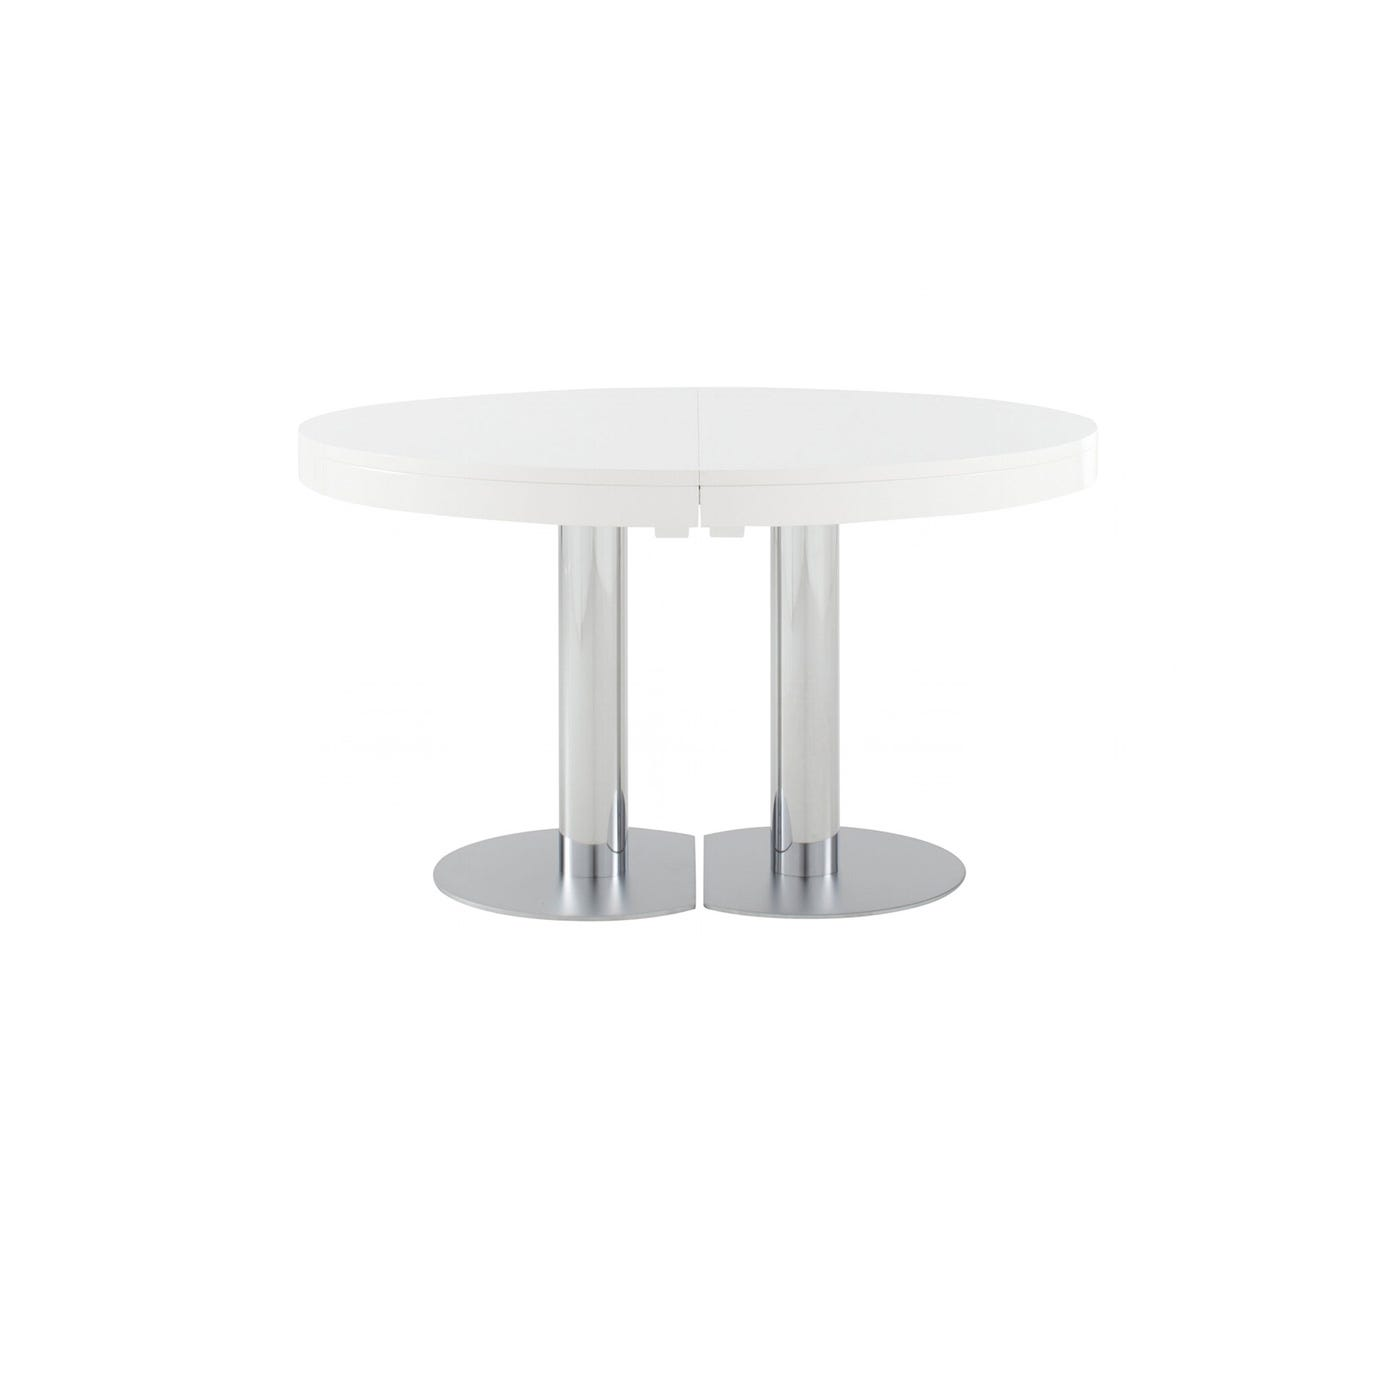 Ligne Roset Craft Dining Table 4-6 Seater White Gloss